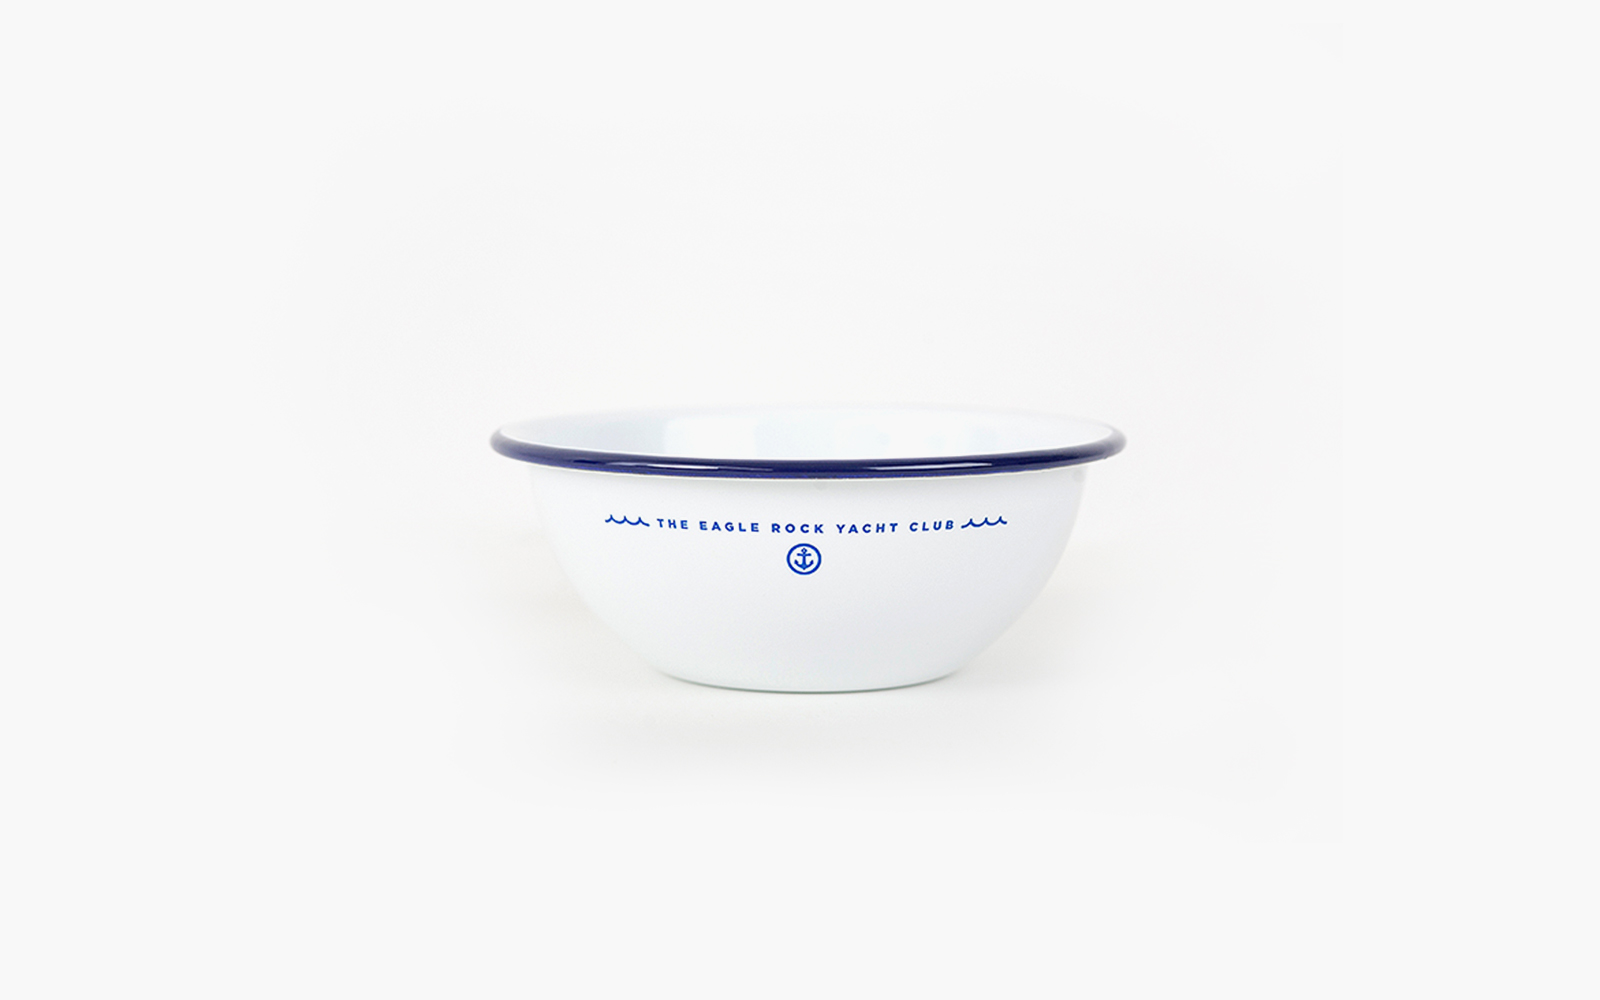 ERYC_Bowl02